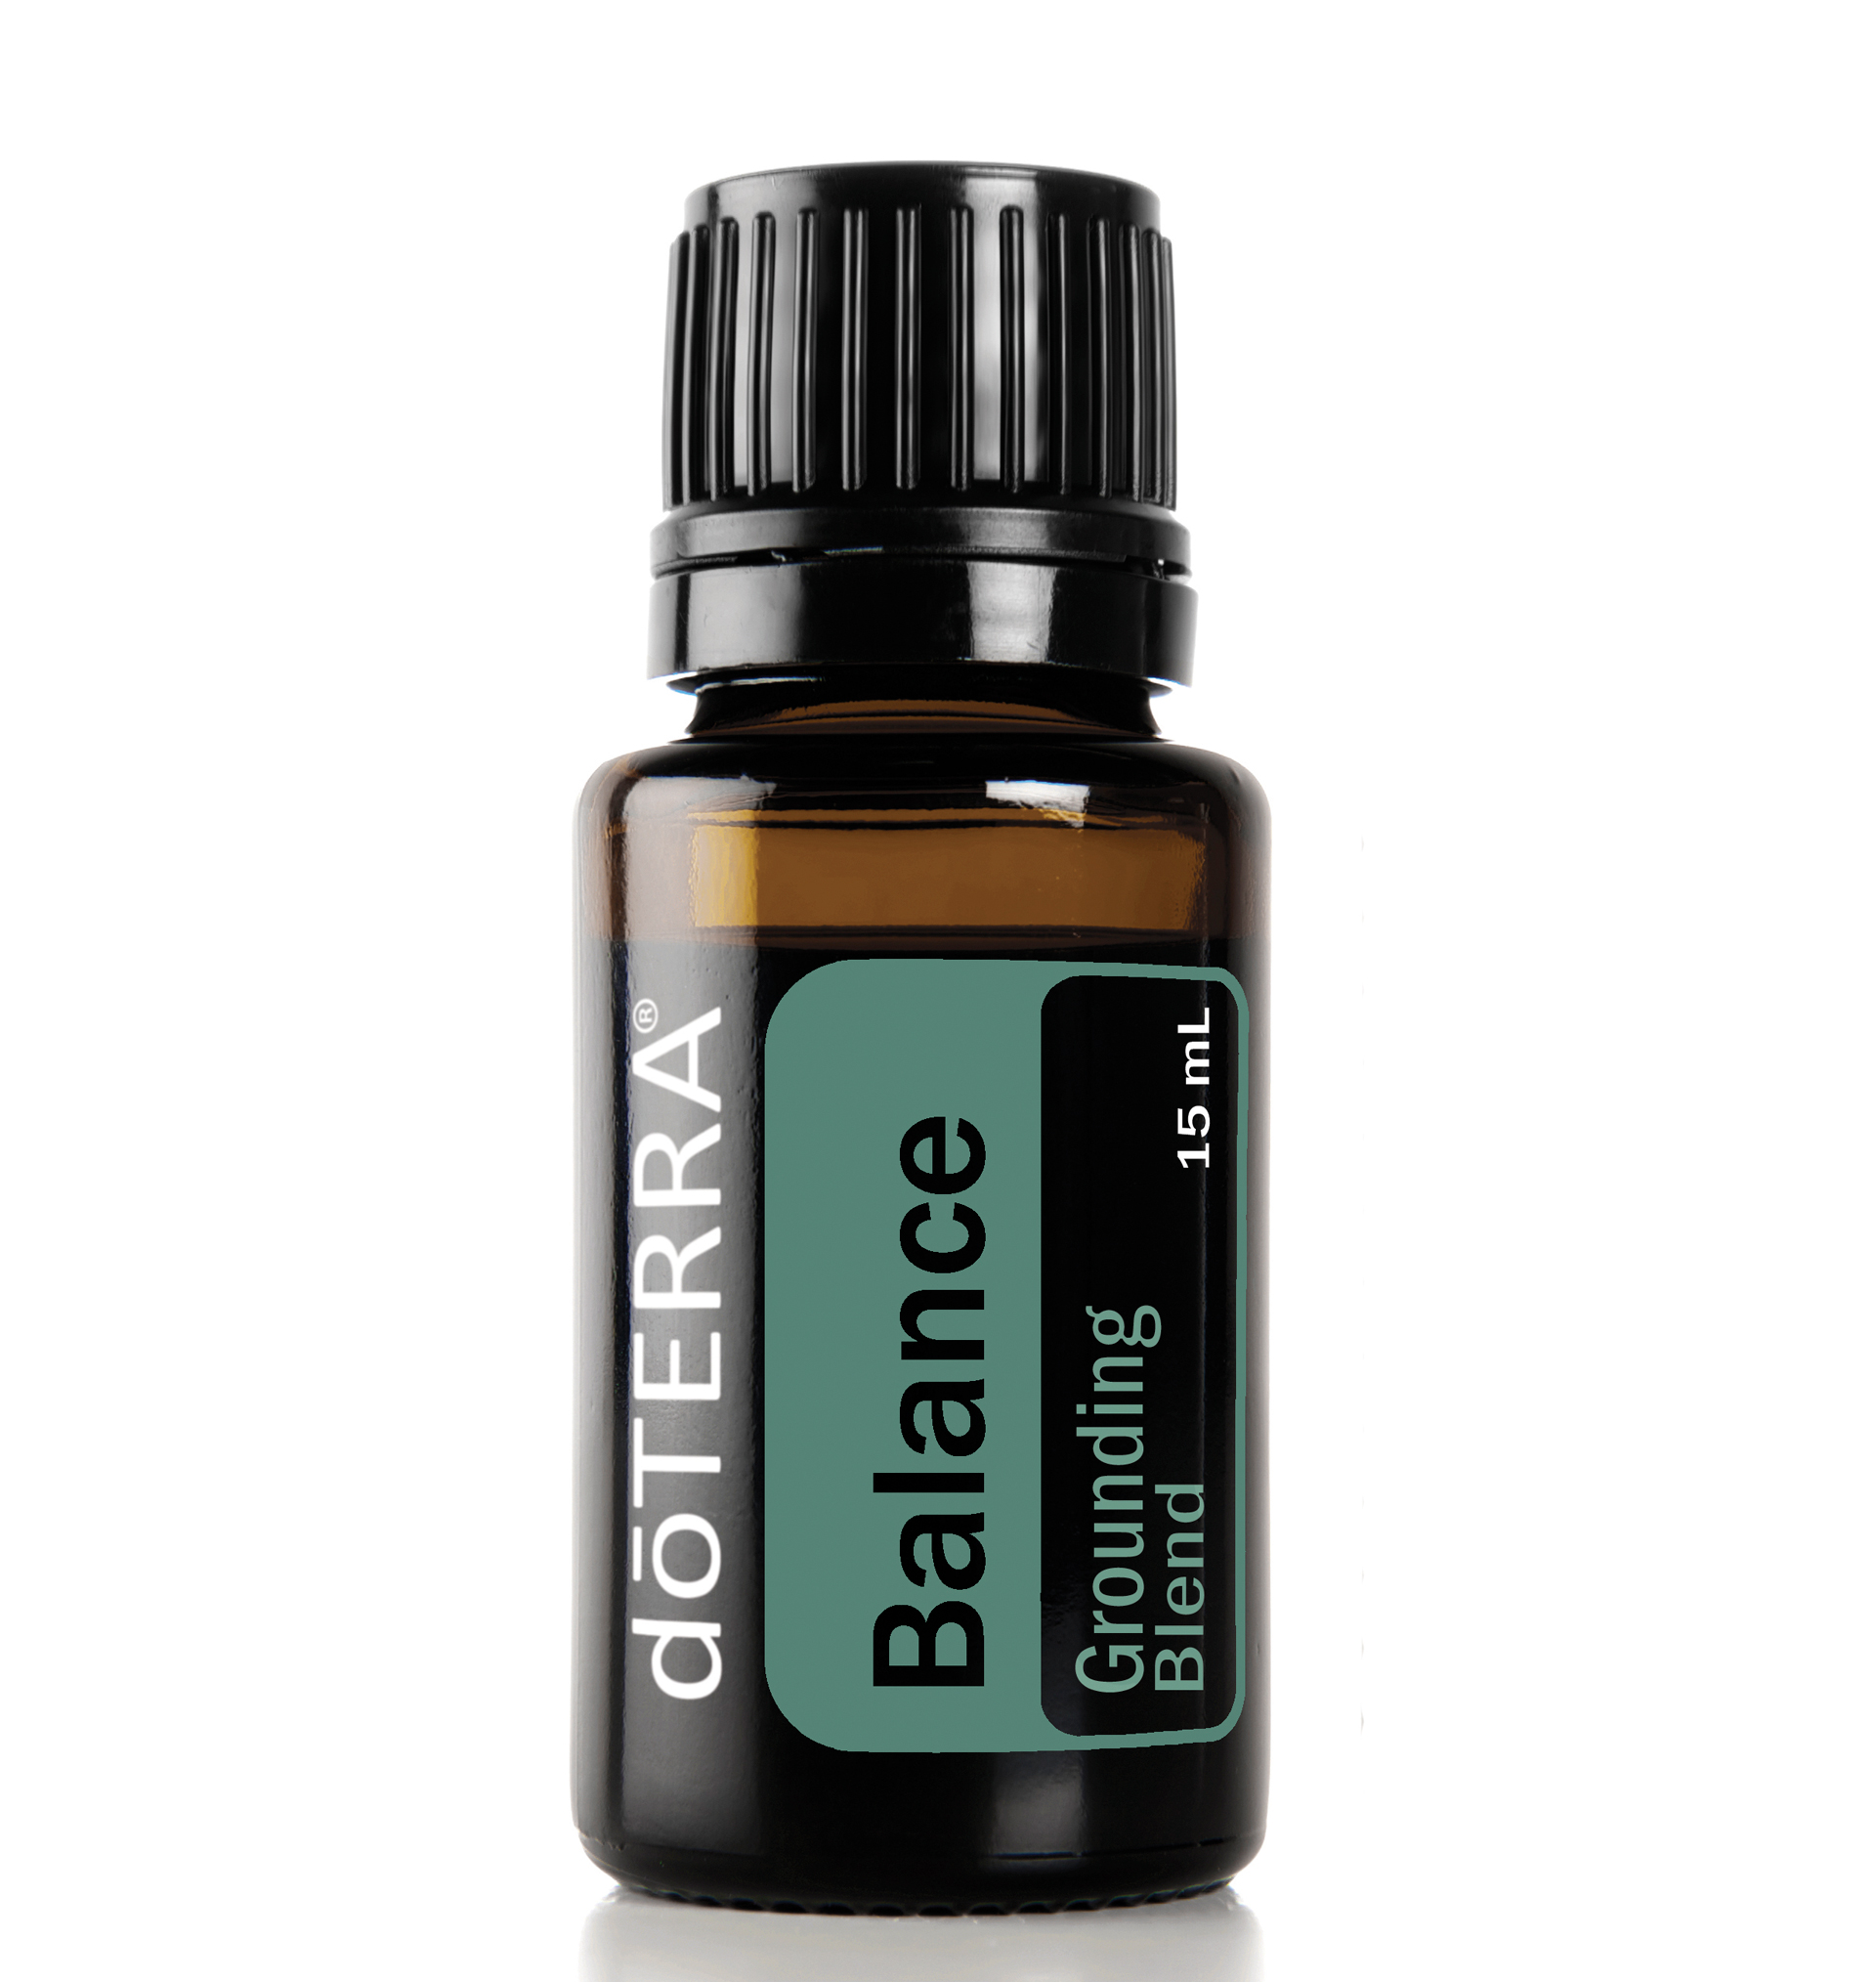 Balance-Uzemňujúca zmes